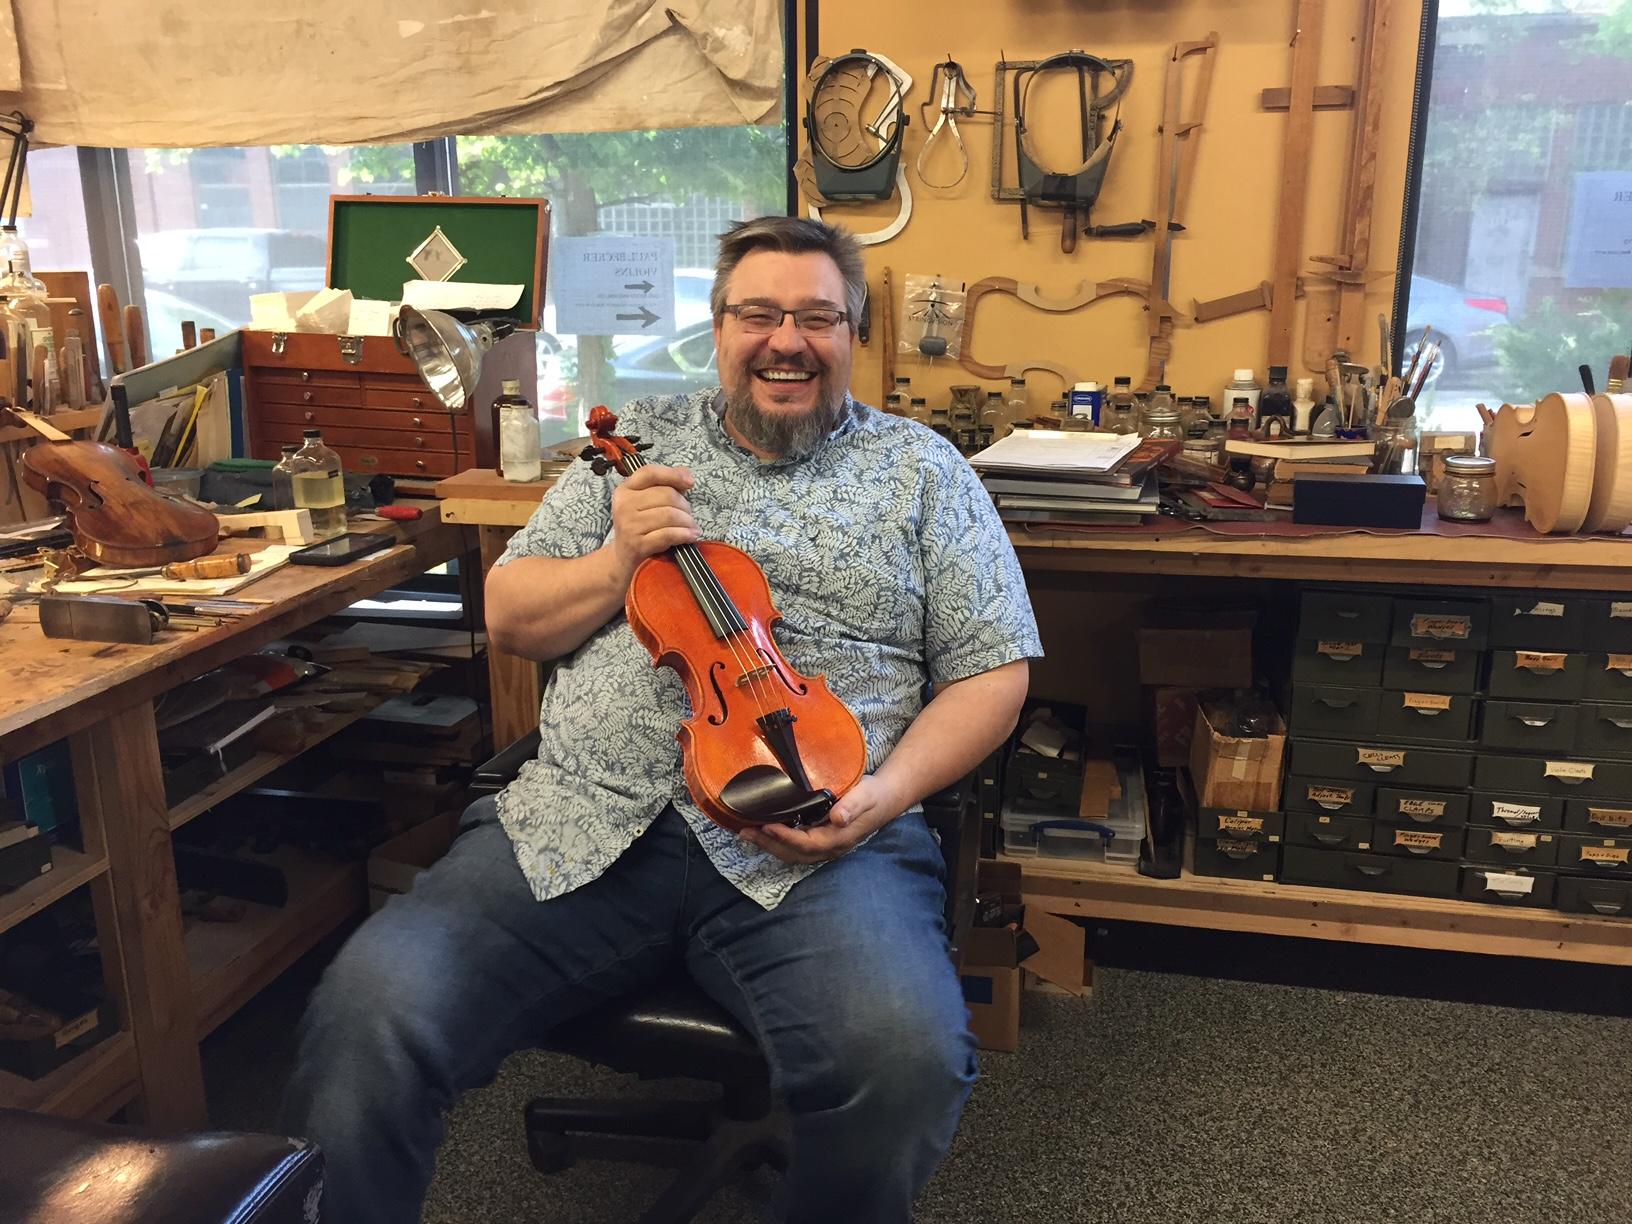 Making-Violins-Carl-Becker-and-Son-001.JPG